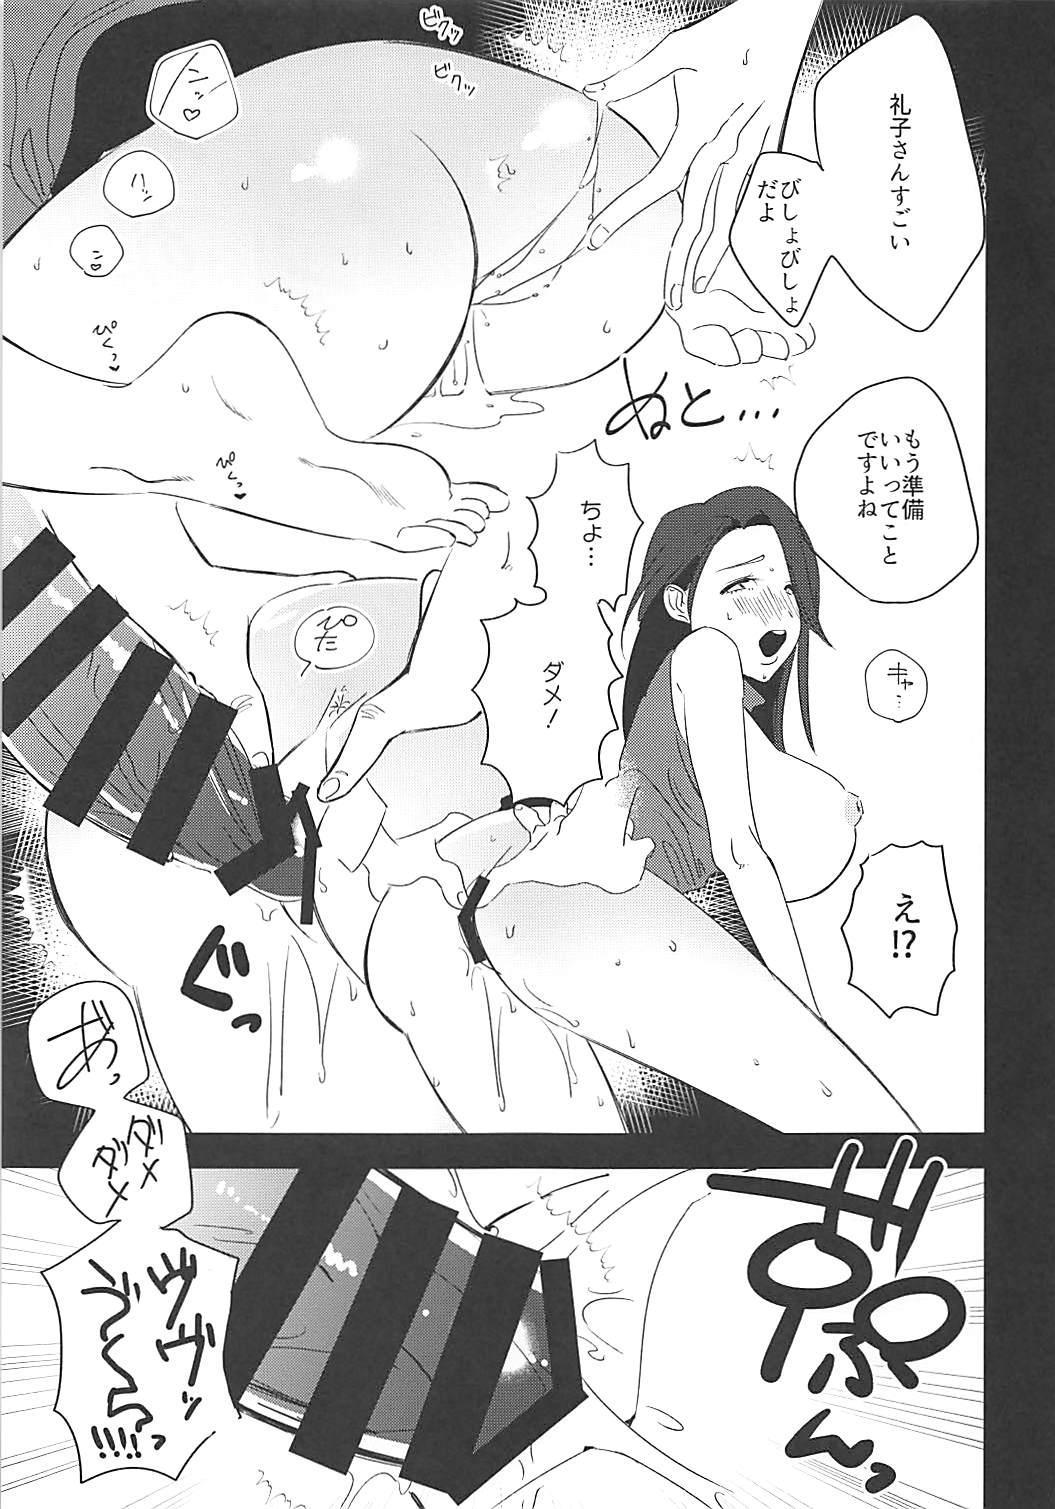 Nomi kurabe de Reiko-san ni kattanode gohobi moratta. 9